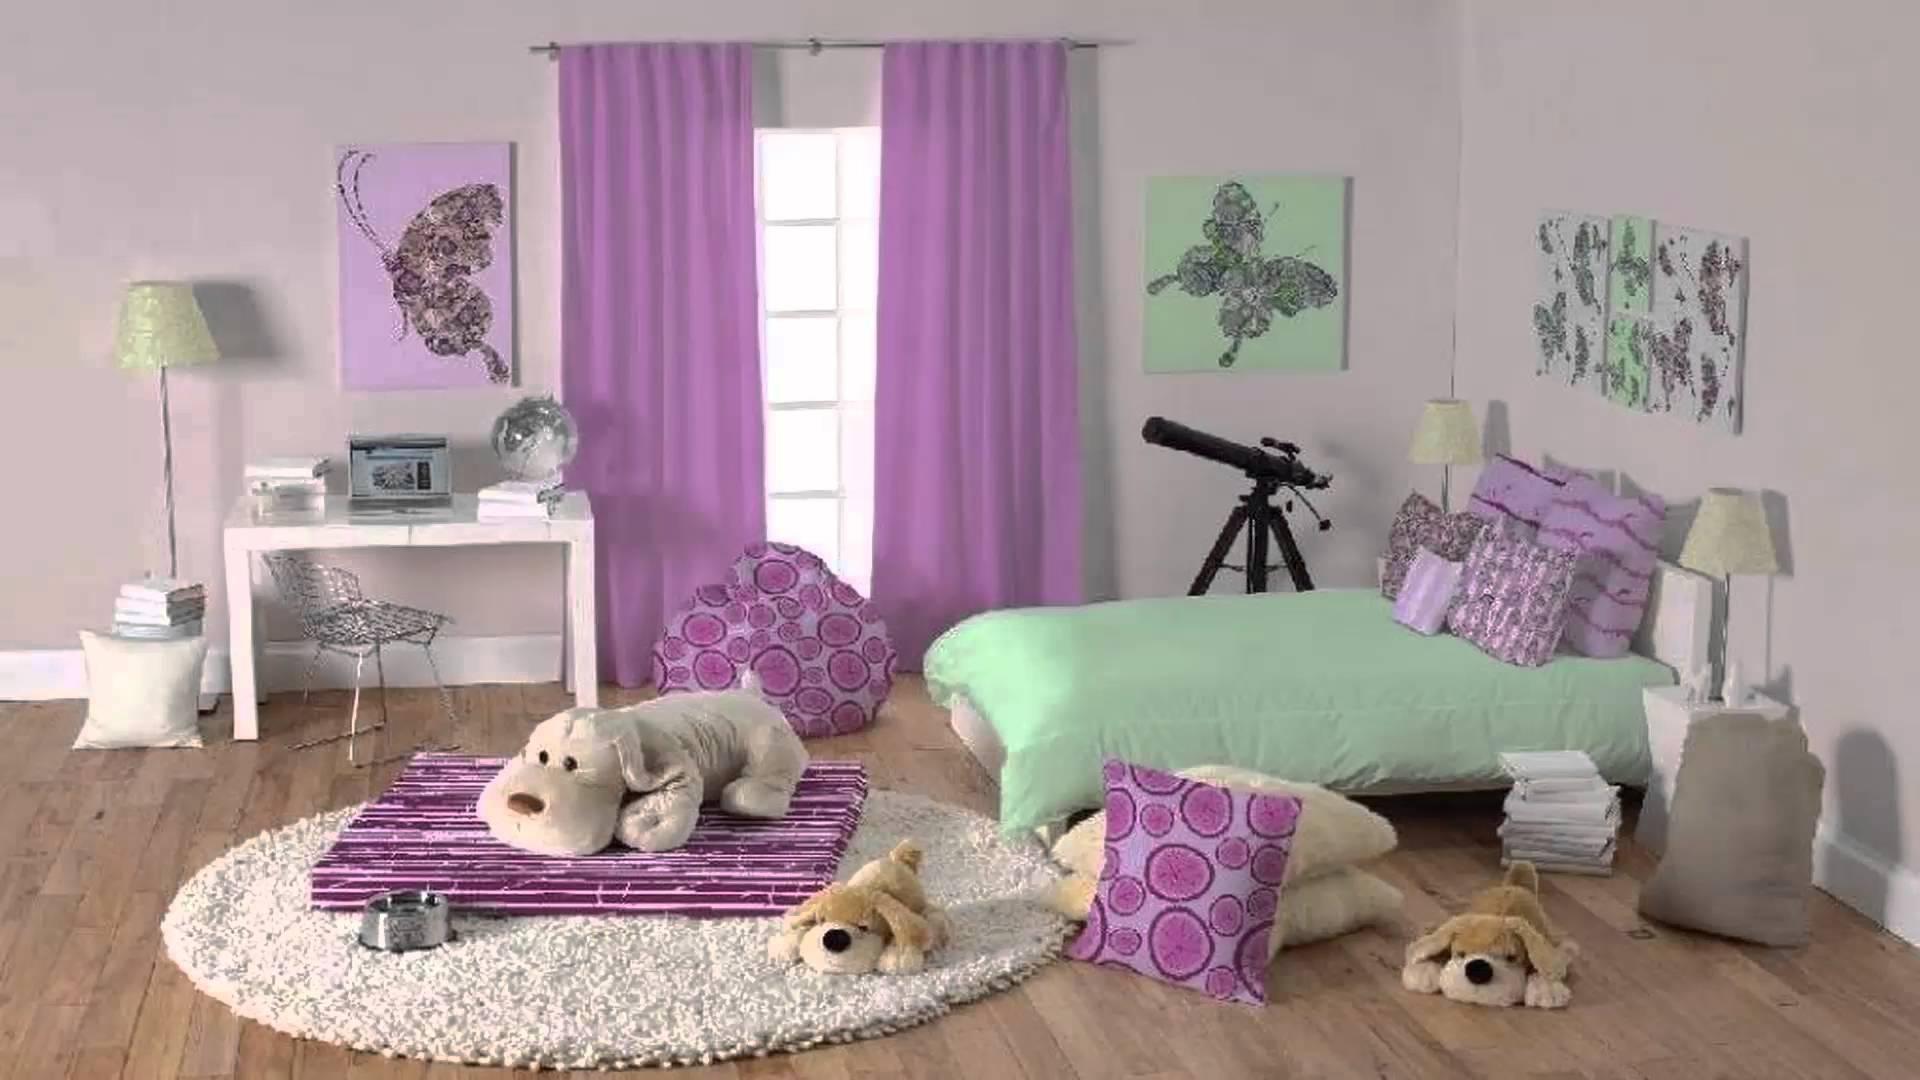 بالصور صور غرف بنات , احدث موضه لغرف نوم البنت الرقيقه 6551 4